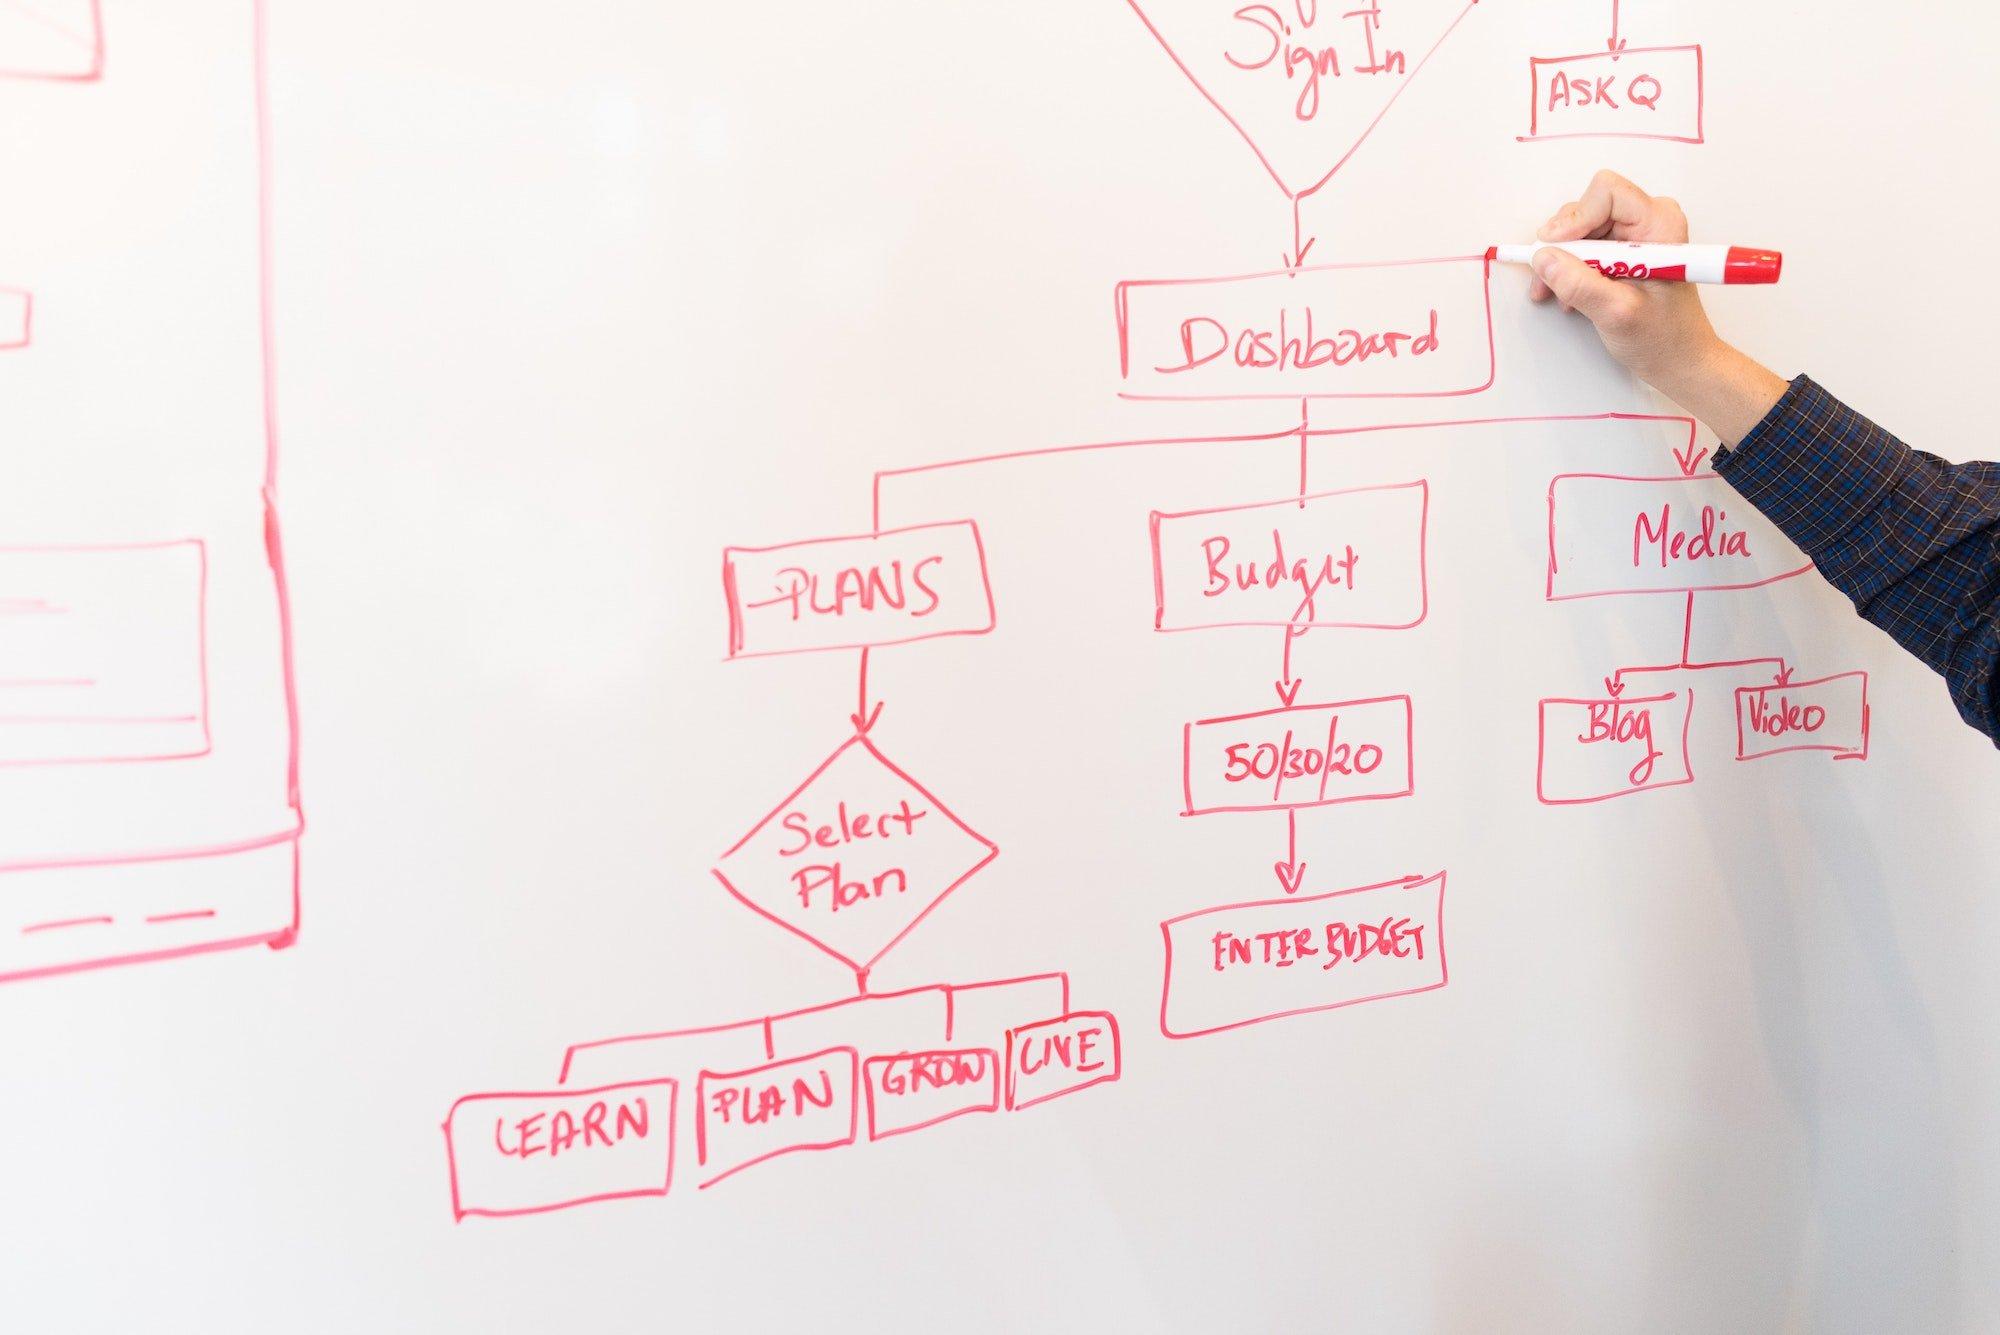 innovation management processes